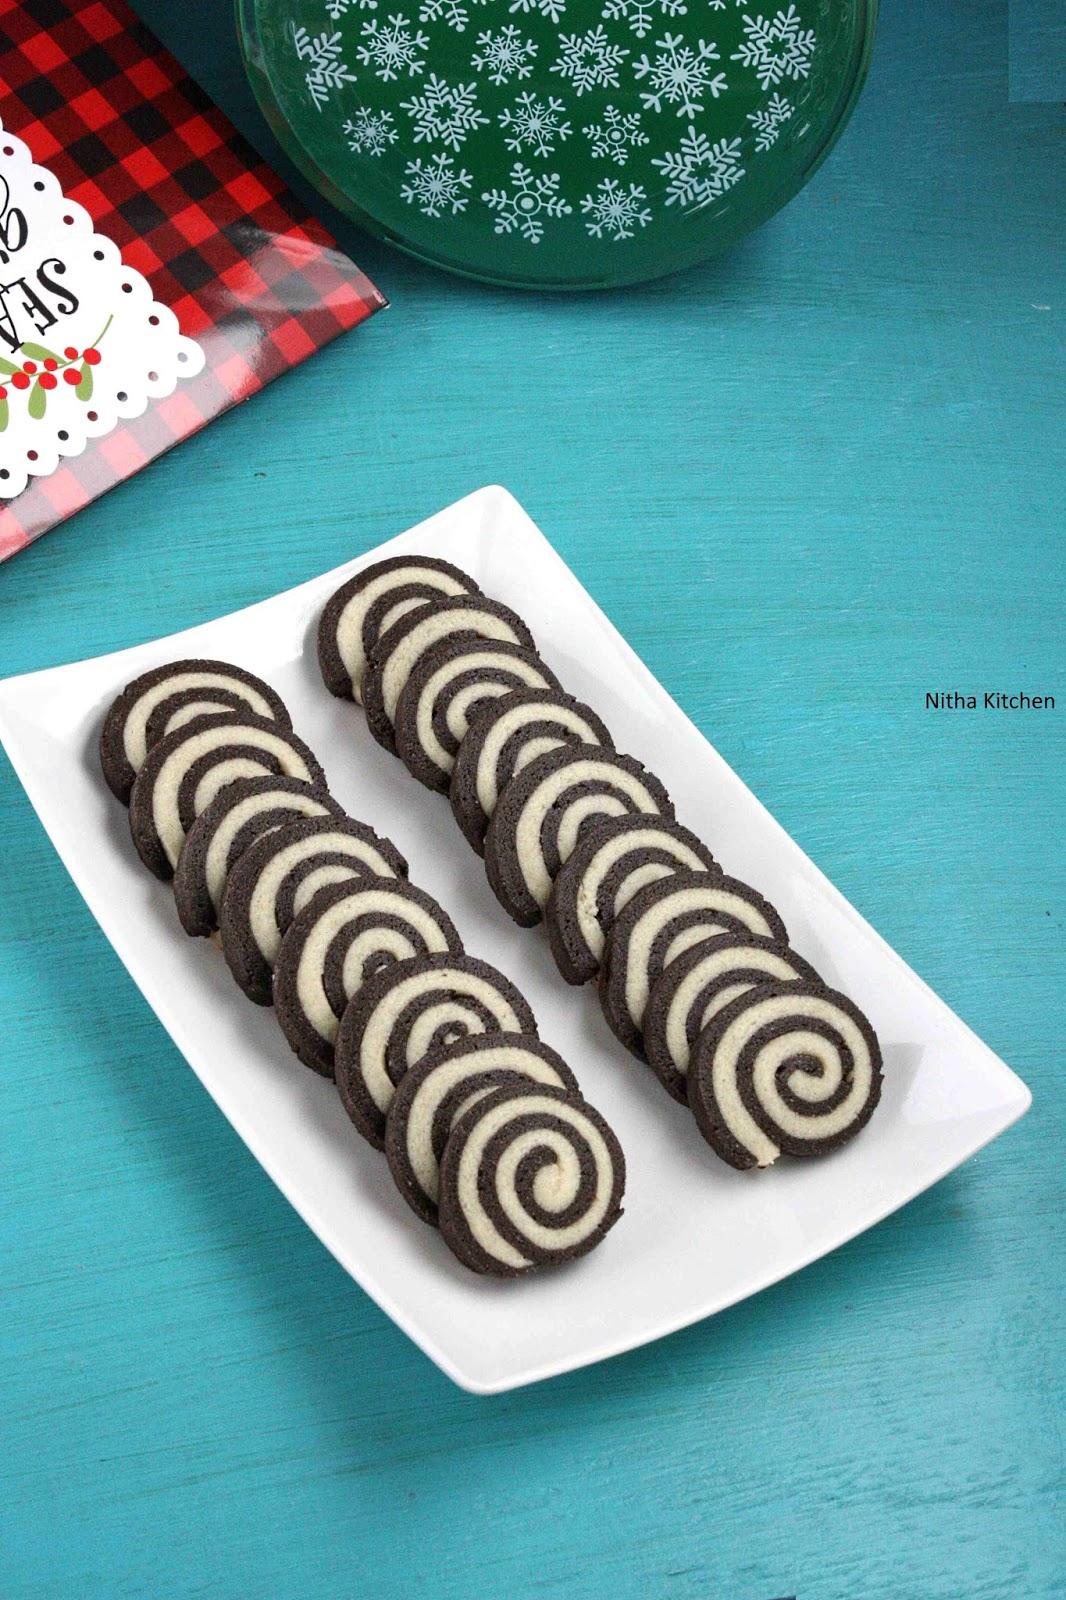 An Eggless Easy Pinwheel Cookies | Merry Christmas - Nitha Kitchen